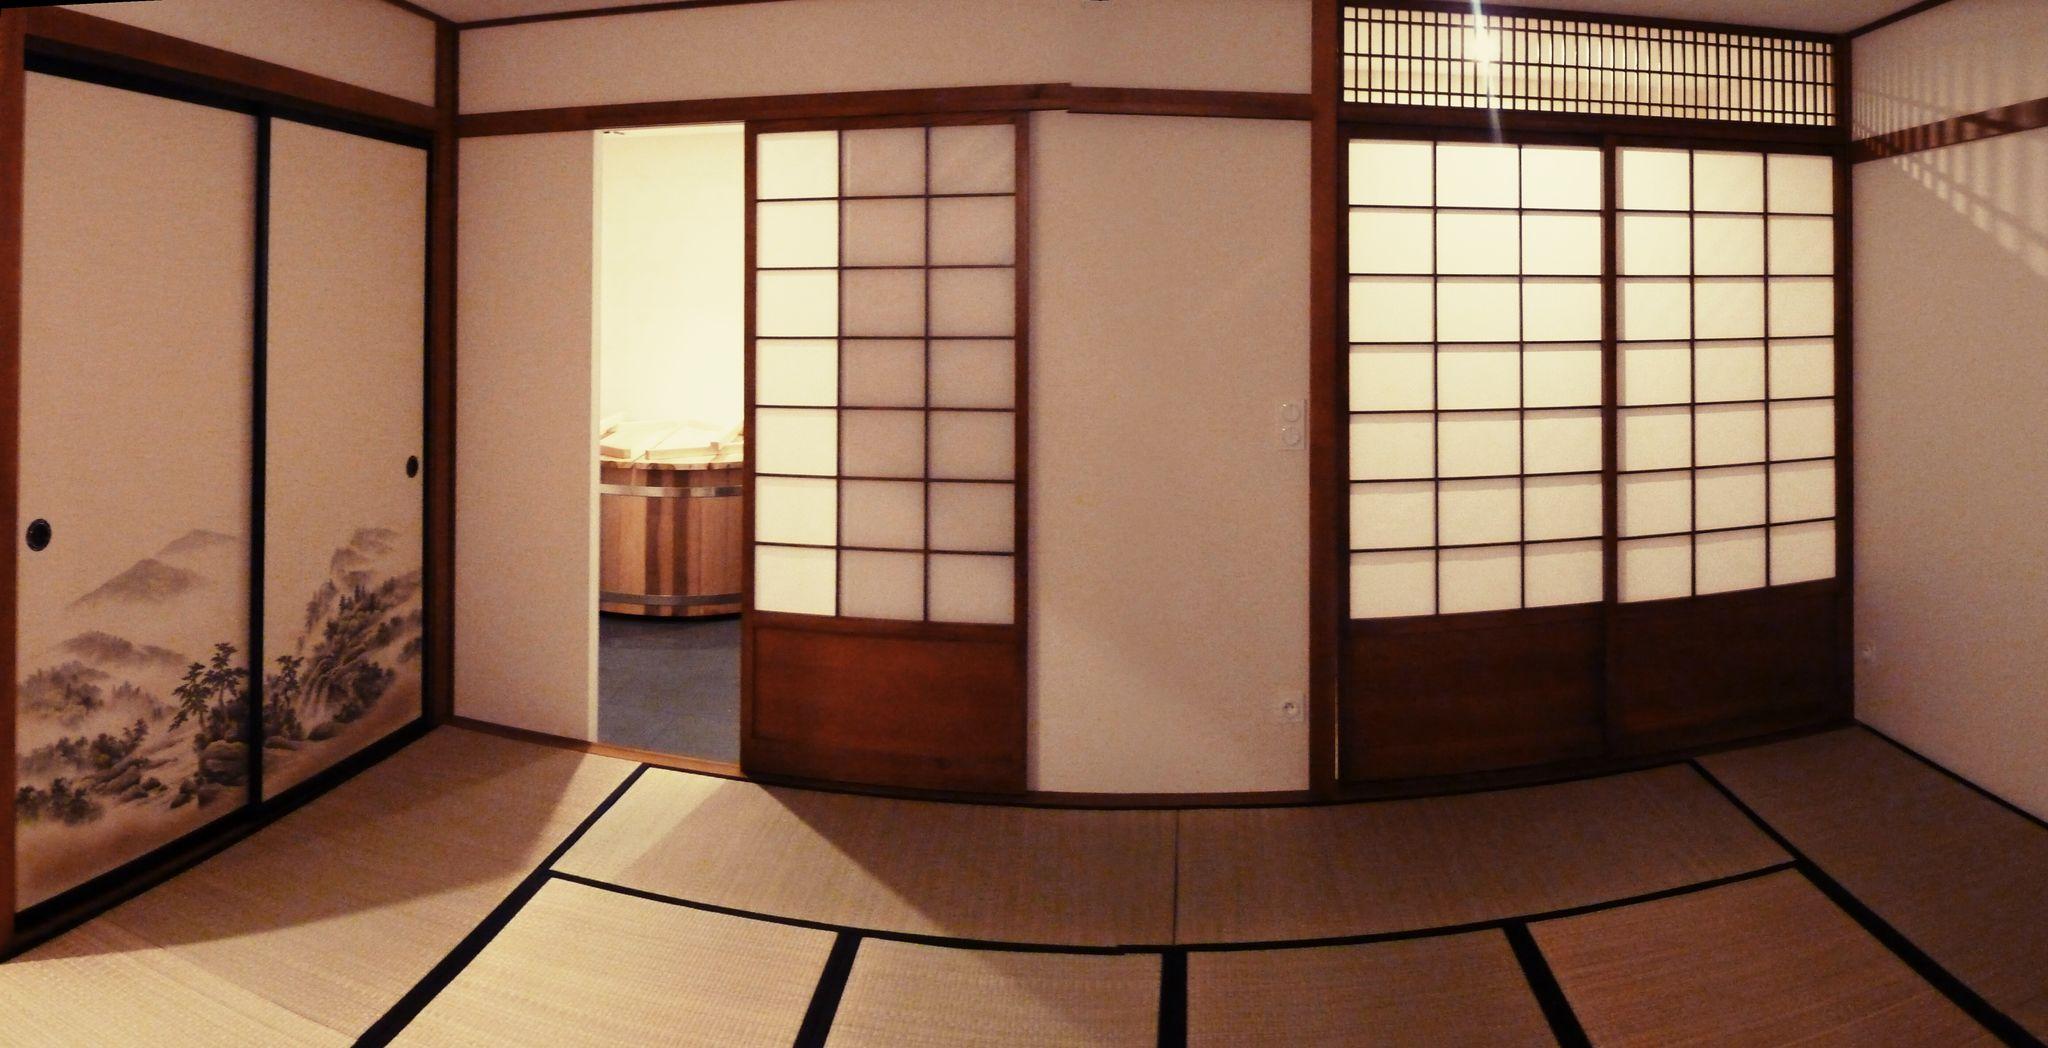 Hosomi Ryokan, le pavillon japonais : un crowdfunding ...